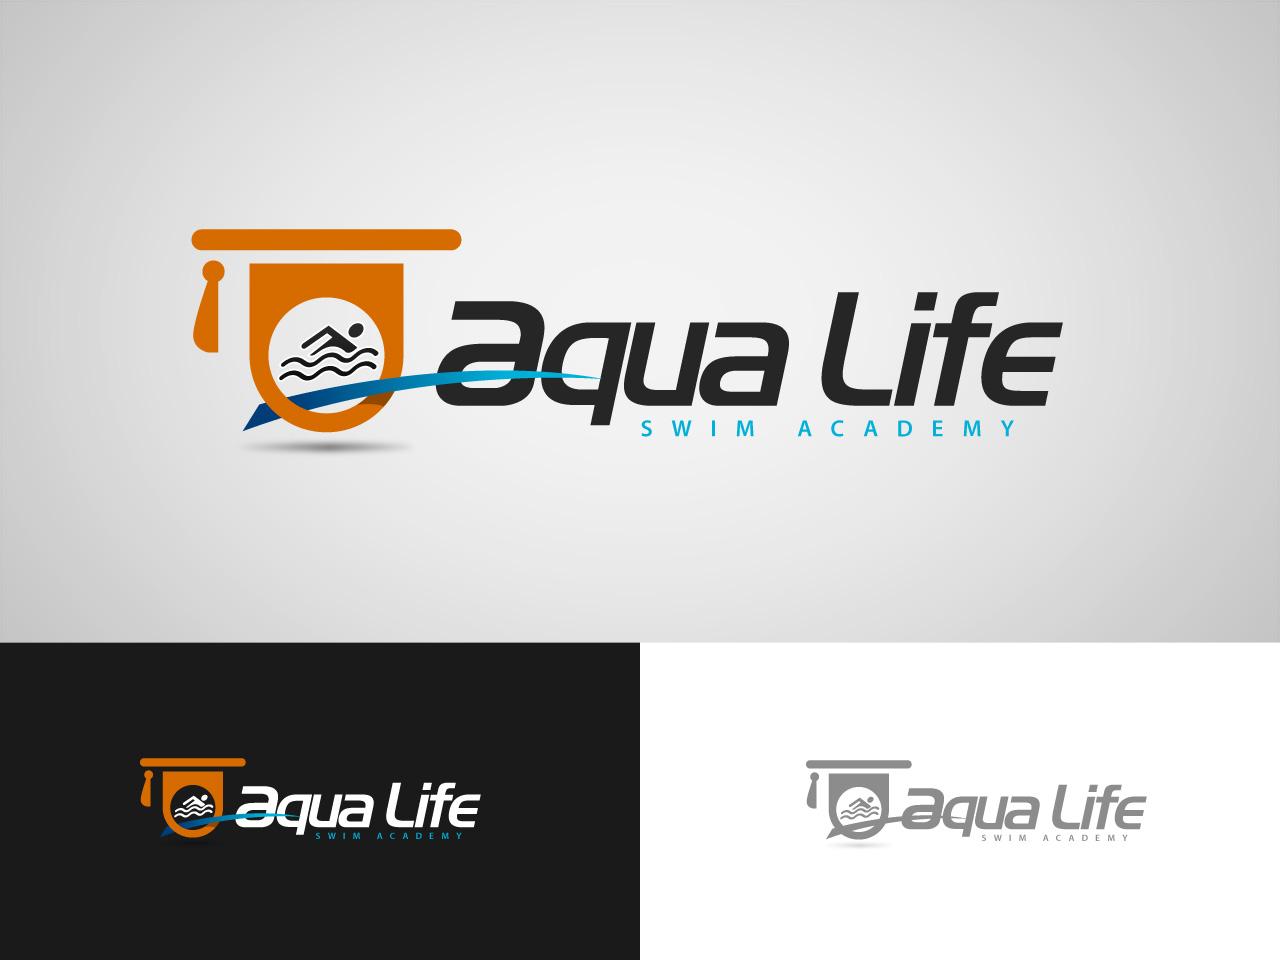 Logo Design by jpbituin - Entry No. 78 in the Logo Design Contest Artistic Logo Design Wanted for The Aqua Life Swim Academy.